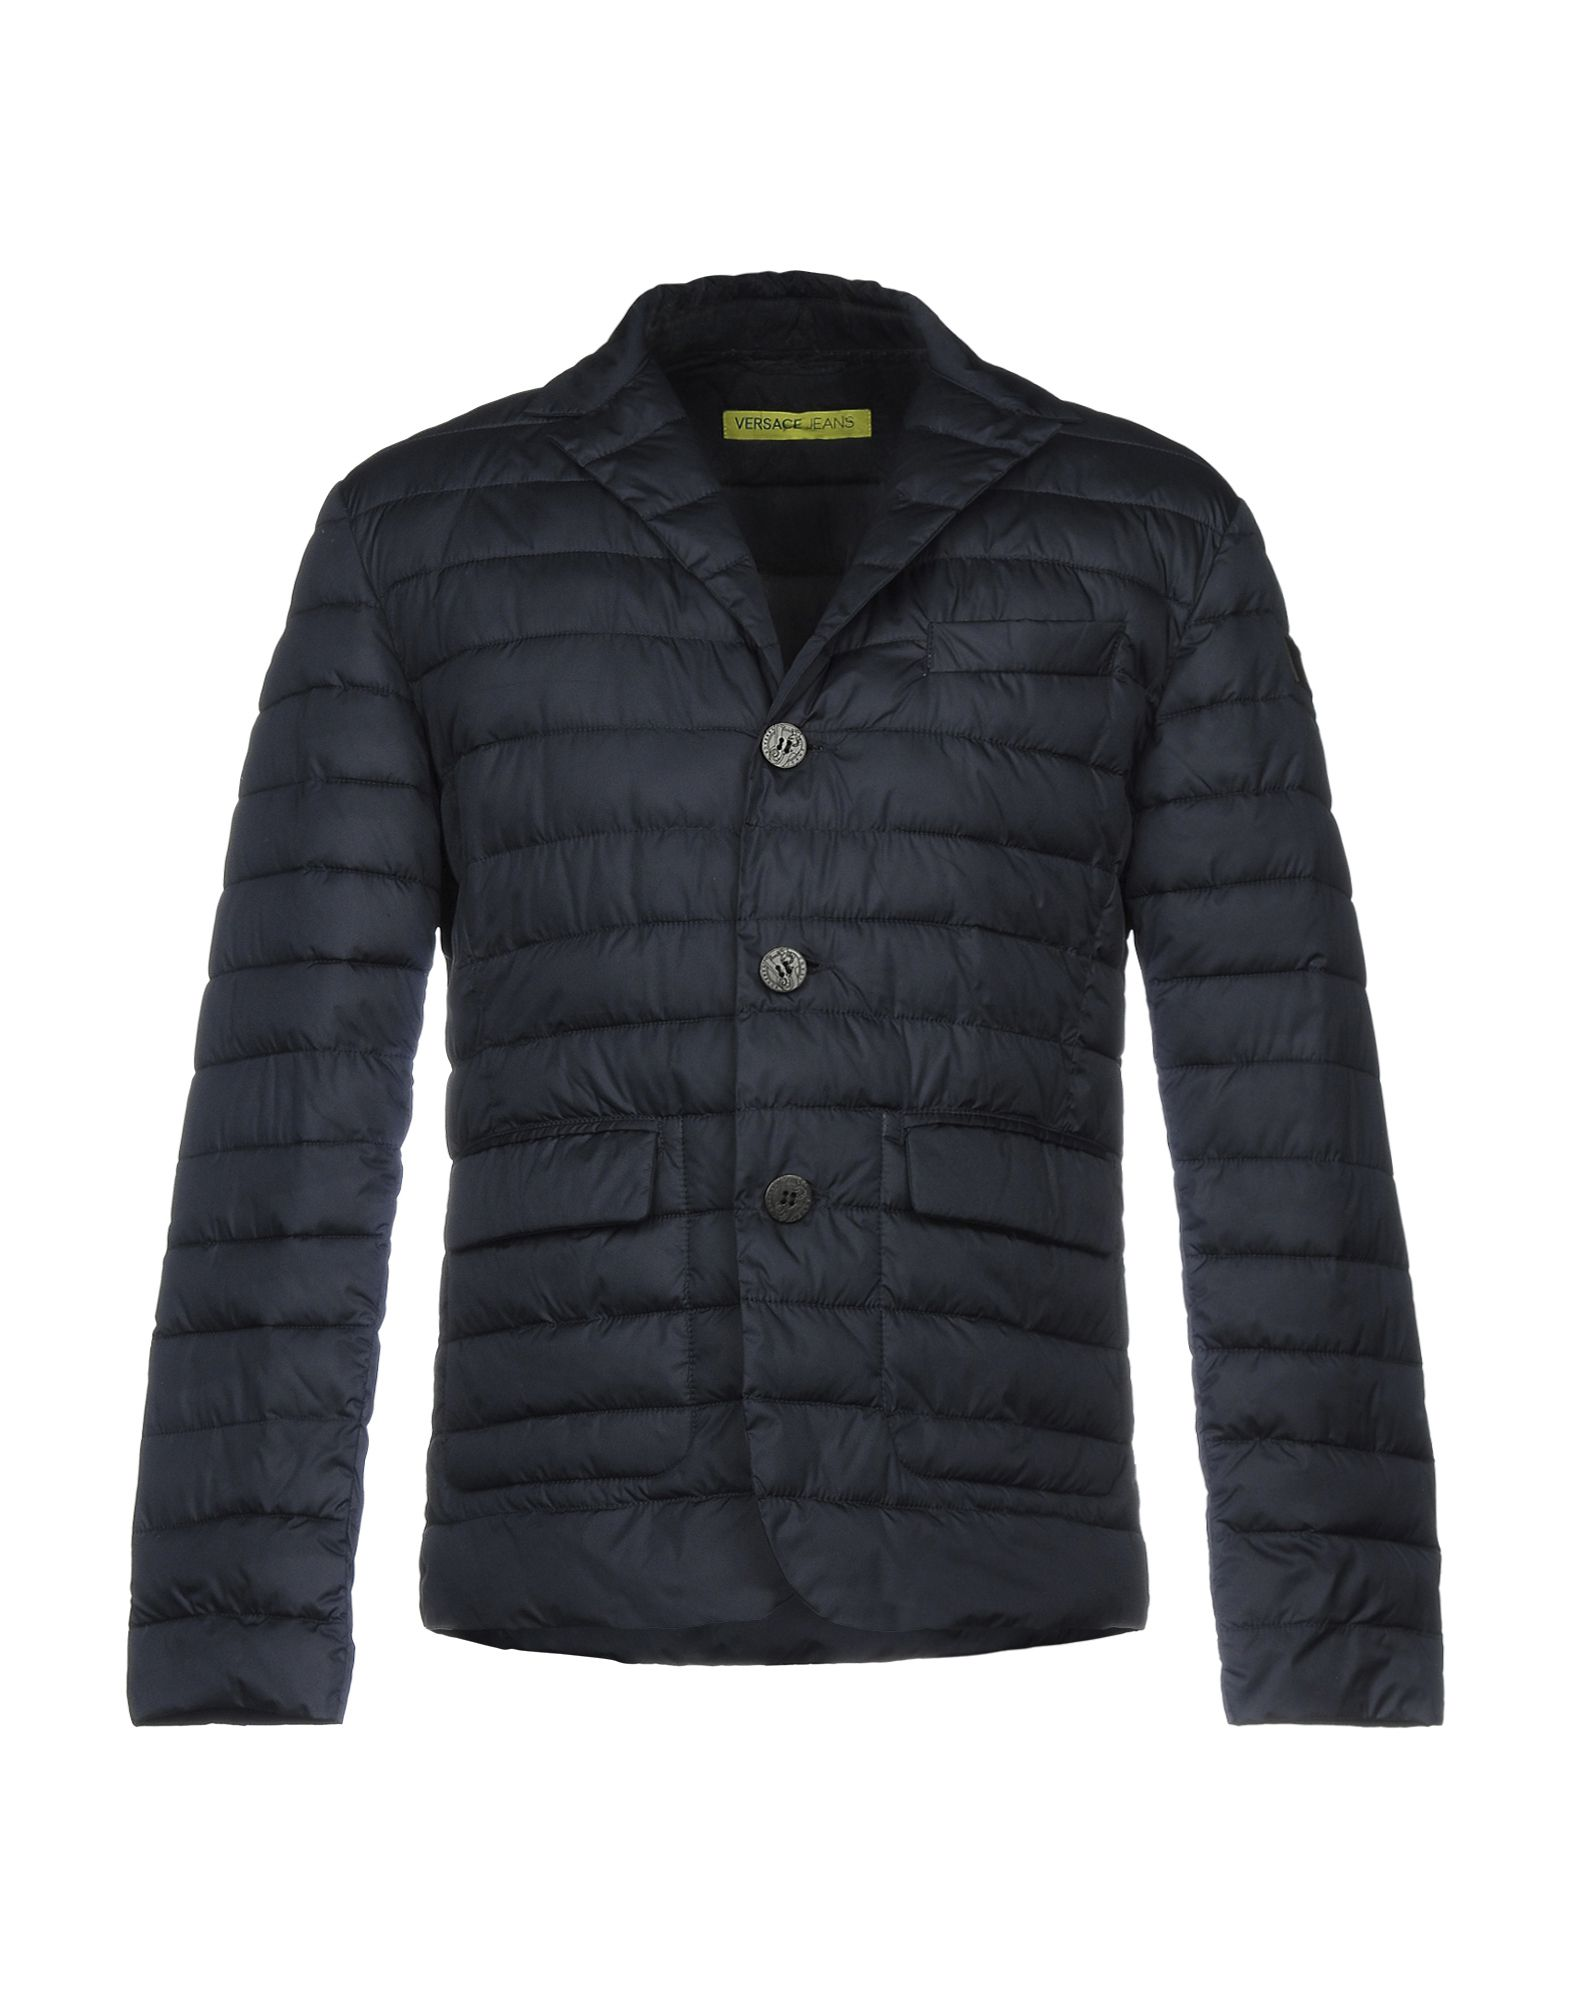 Piumino Sintetico Versace Jeans Uomo - Acquista online su